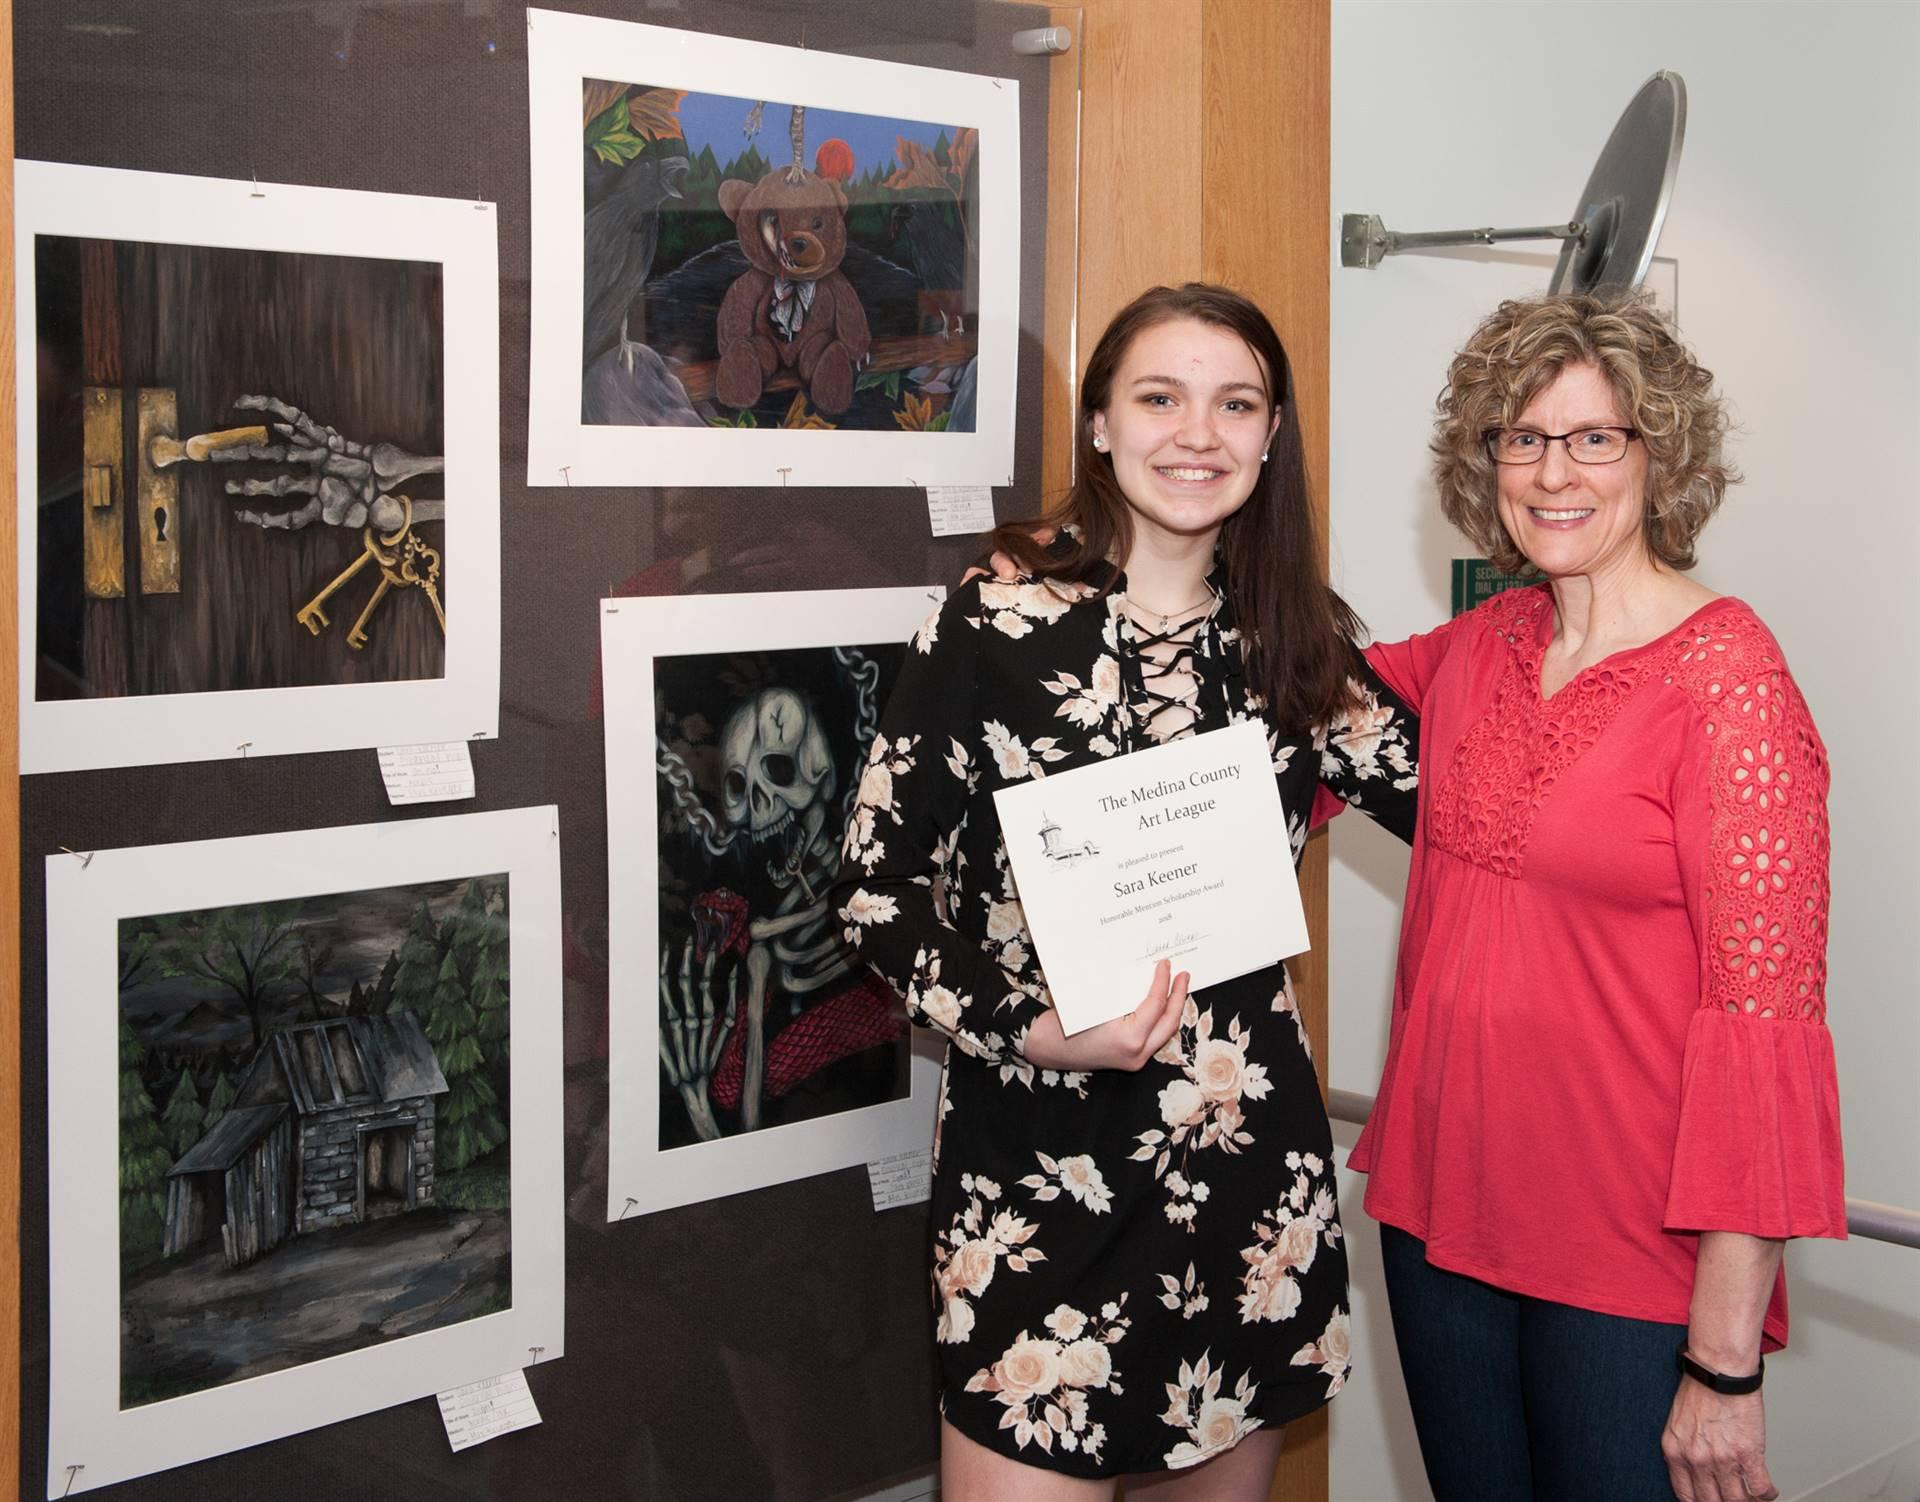 Sara Keener, Hon. Mention MCAL Scholarship Winner, and Julie Krueger, art teacher